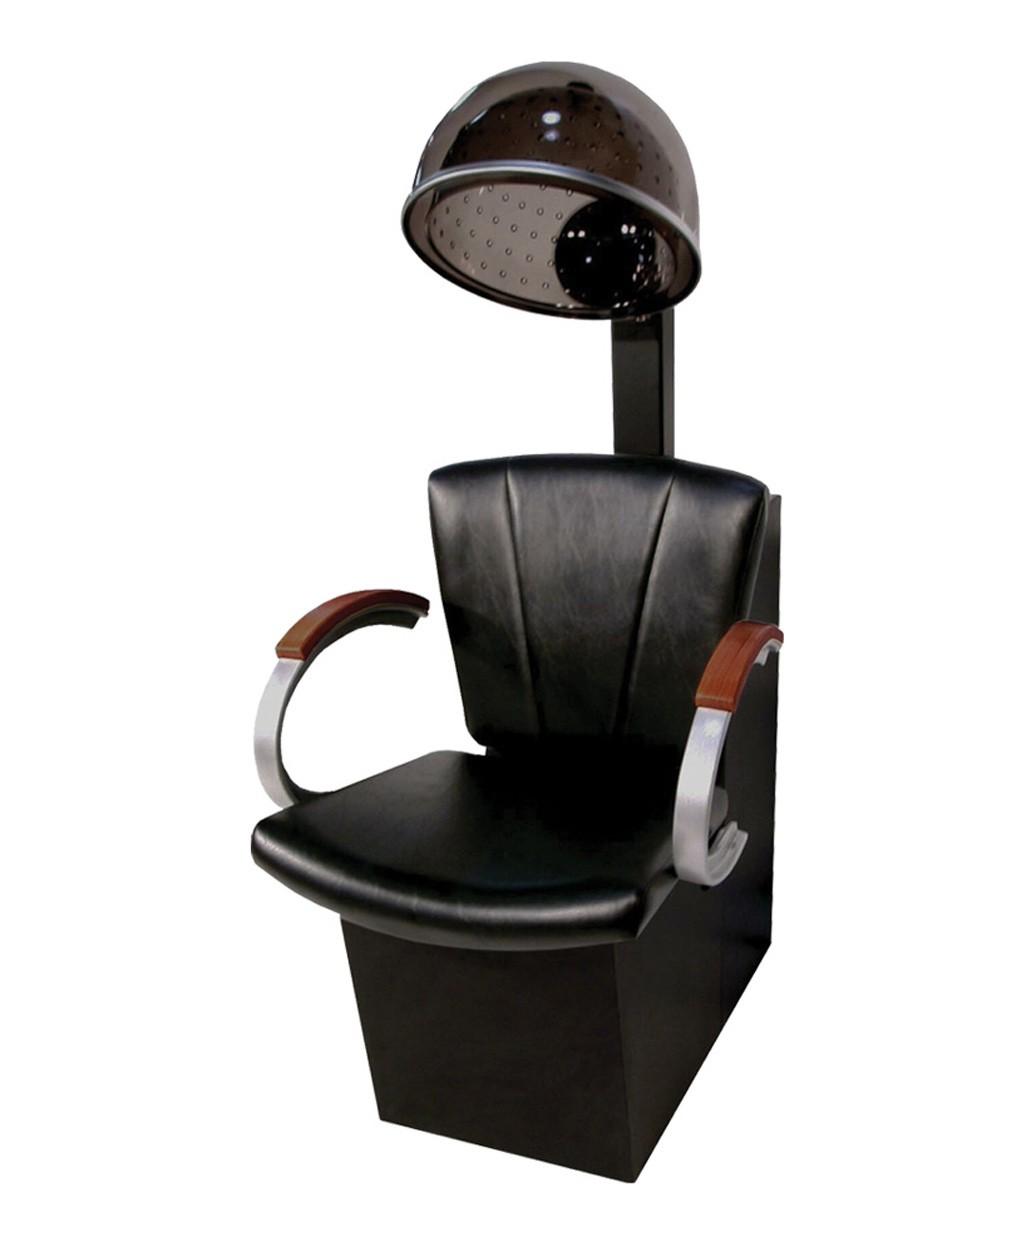 Collins 9721 Vanelle Dryer Chair